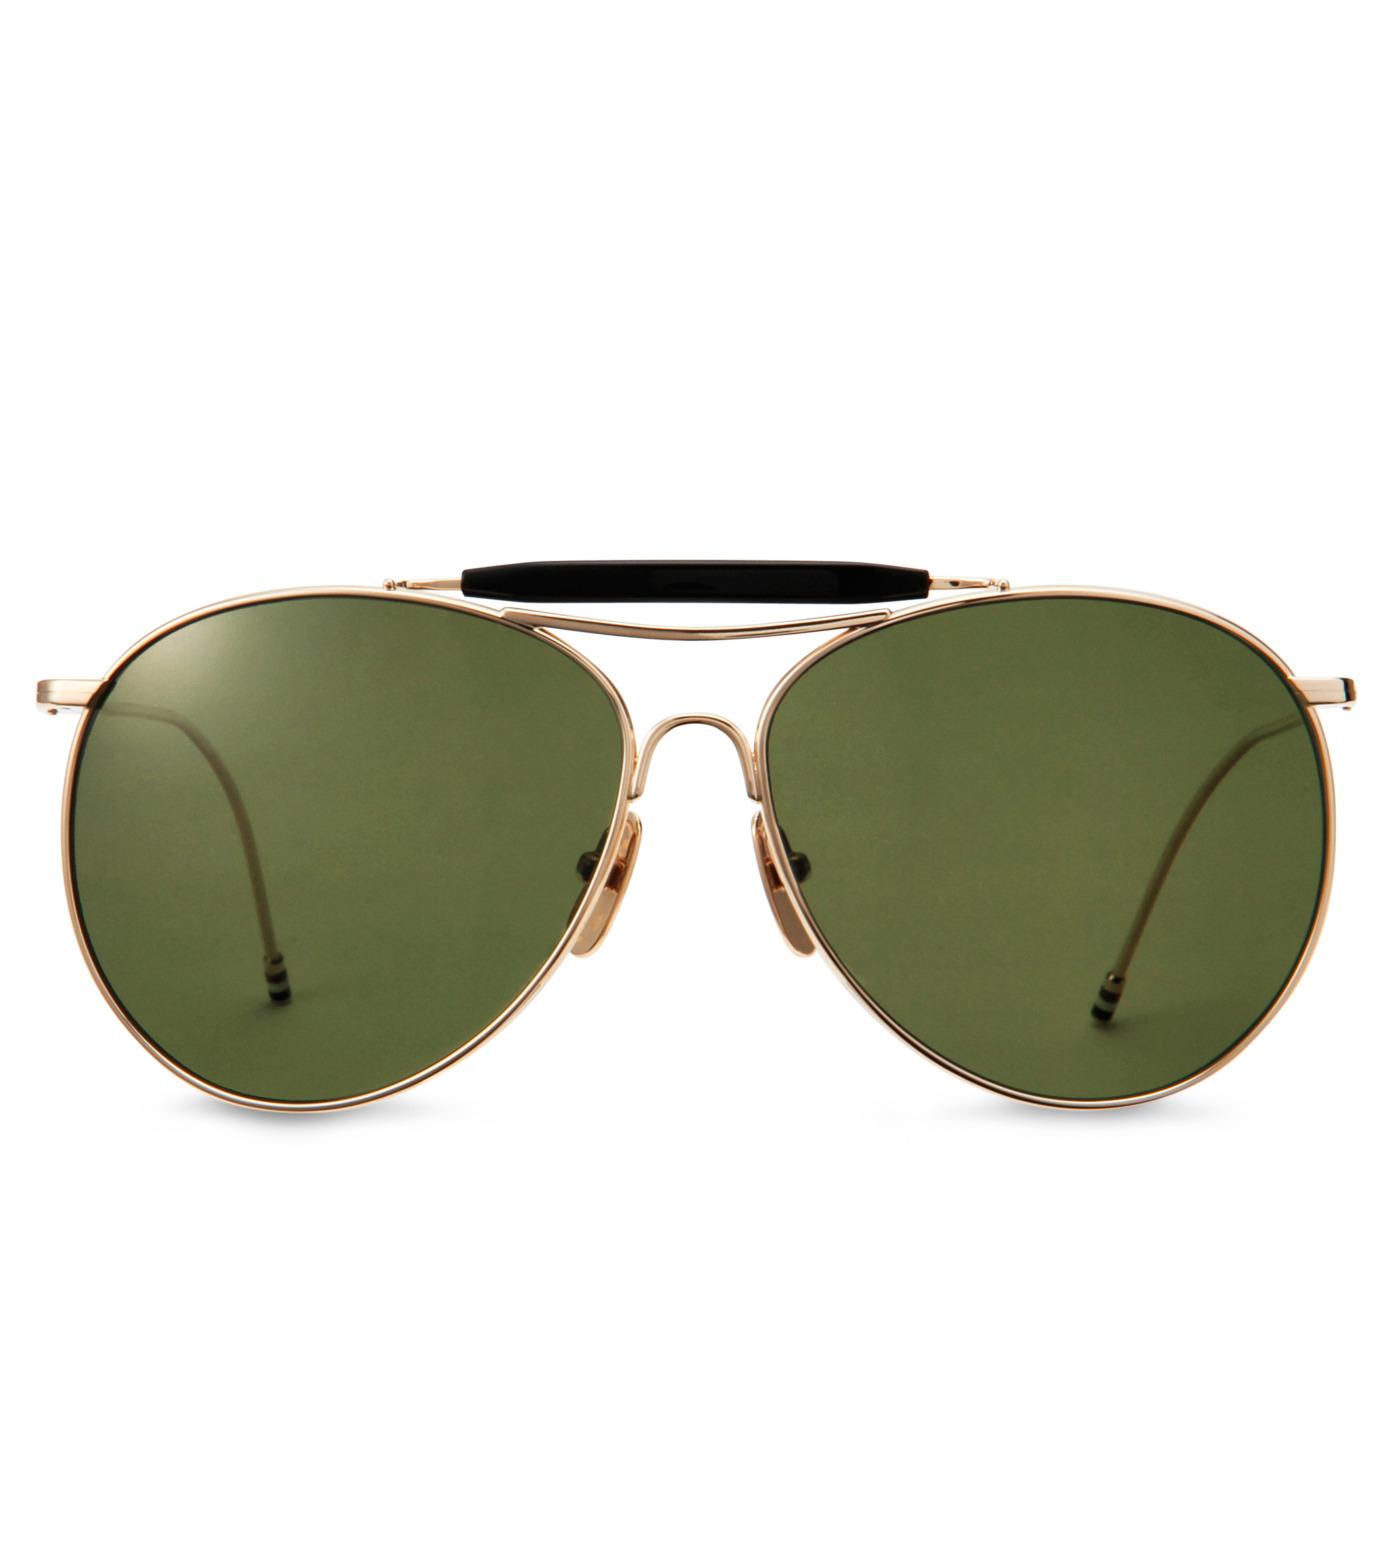 Thom Browne Eye Wear(トム・ブラウン・アイウェア)のShiny 12k gold-GOLD(アイウェア/eyewear)-TB-020B-T-59-2 拡大詳細画像3